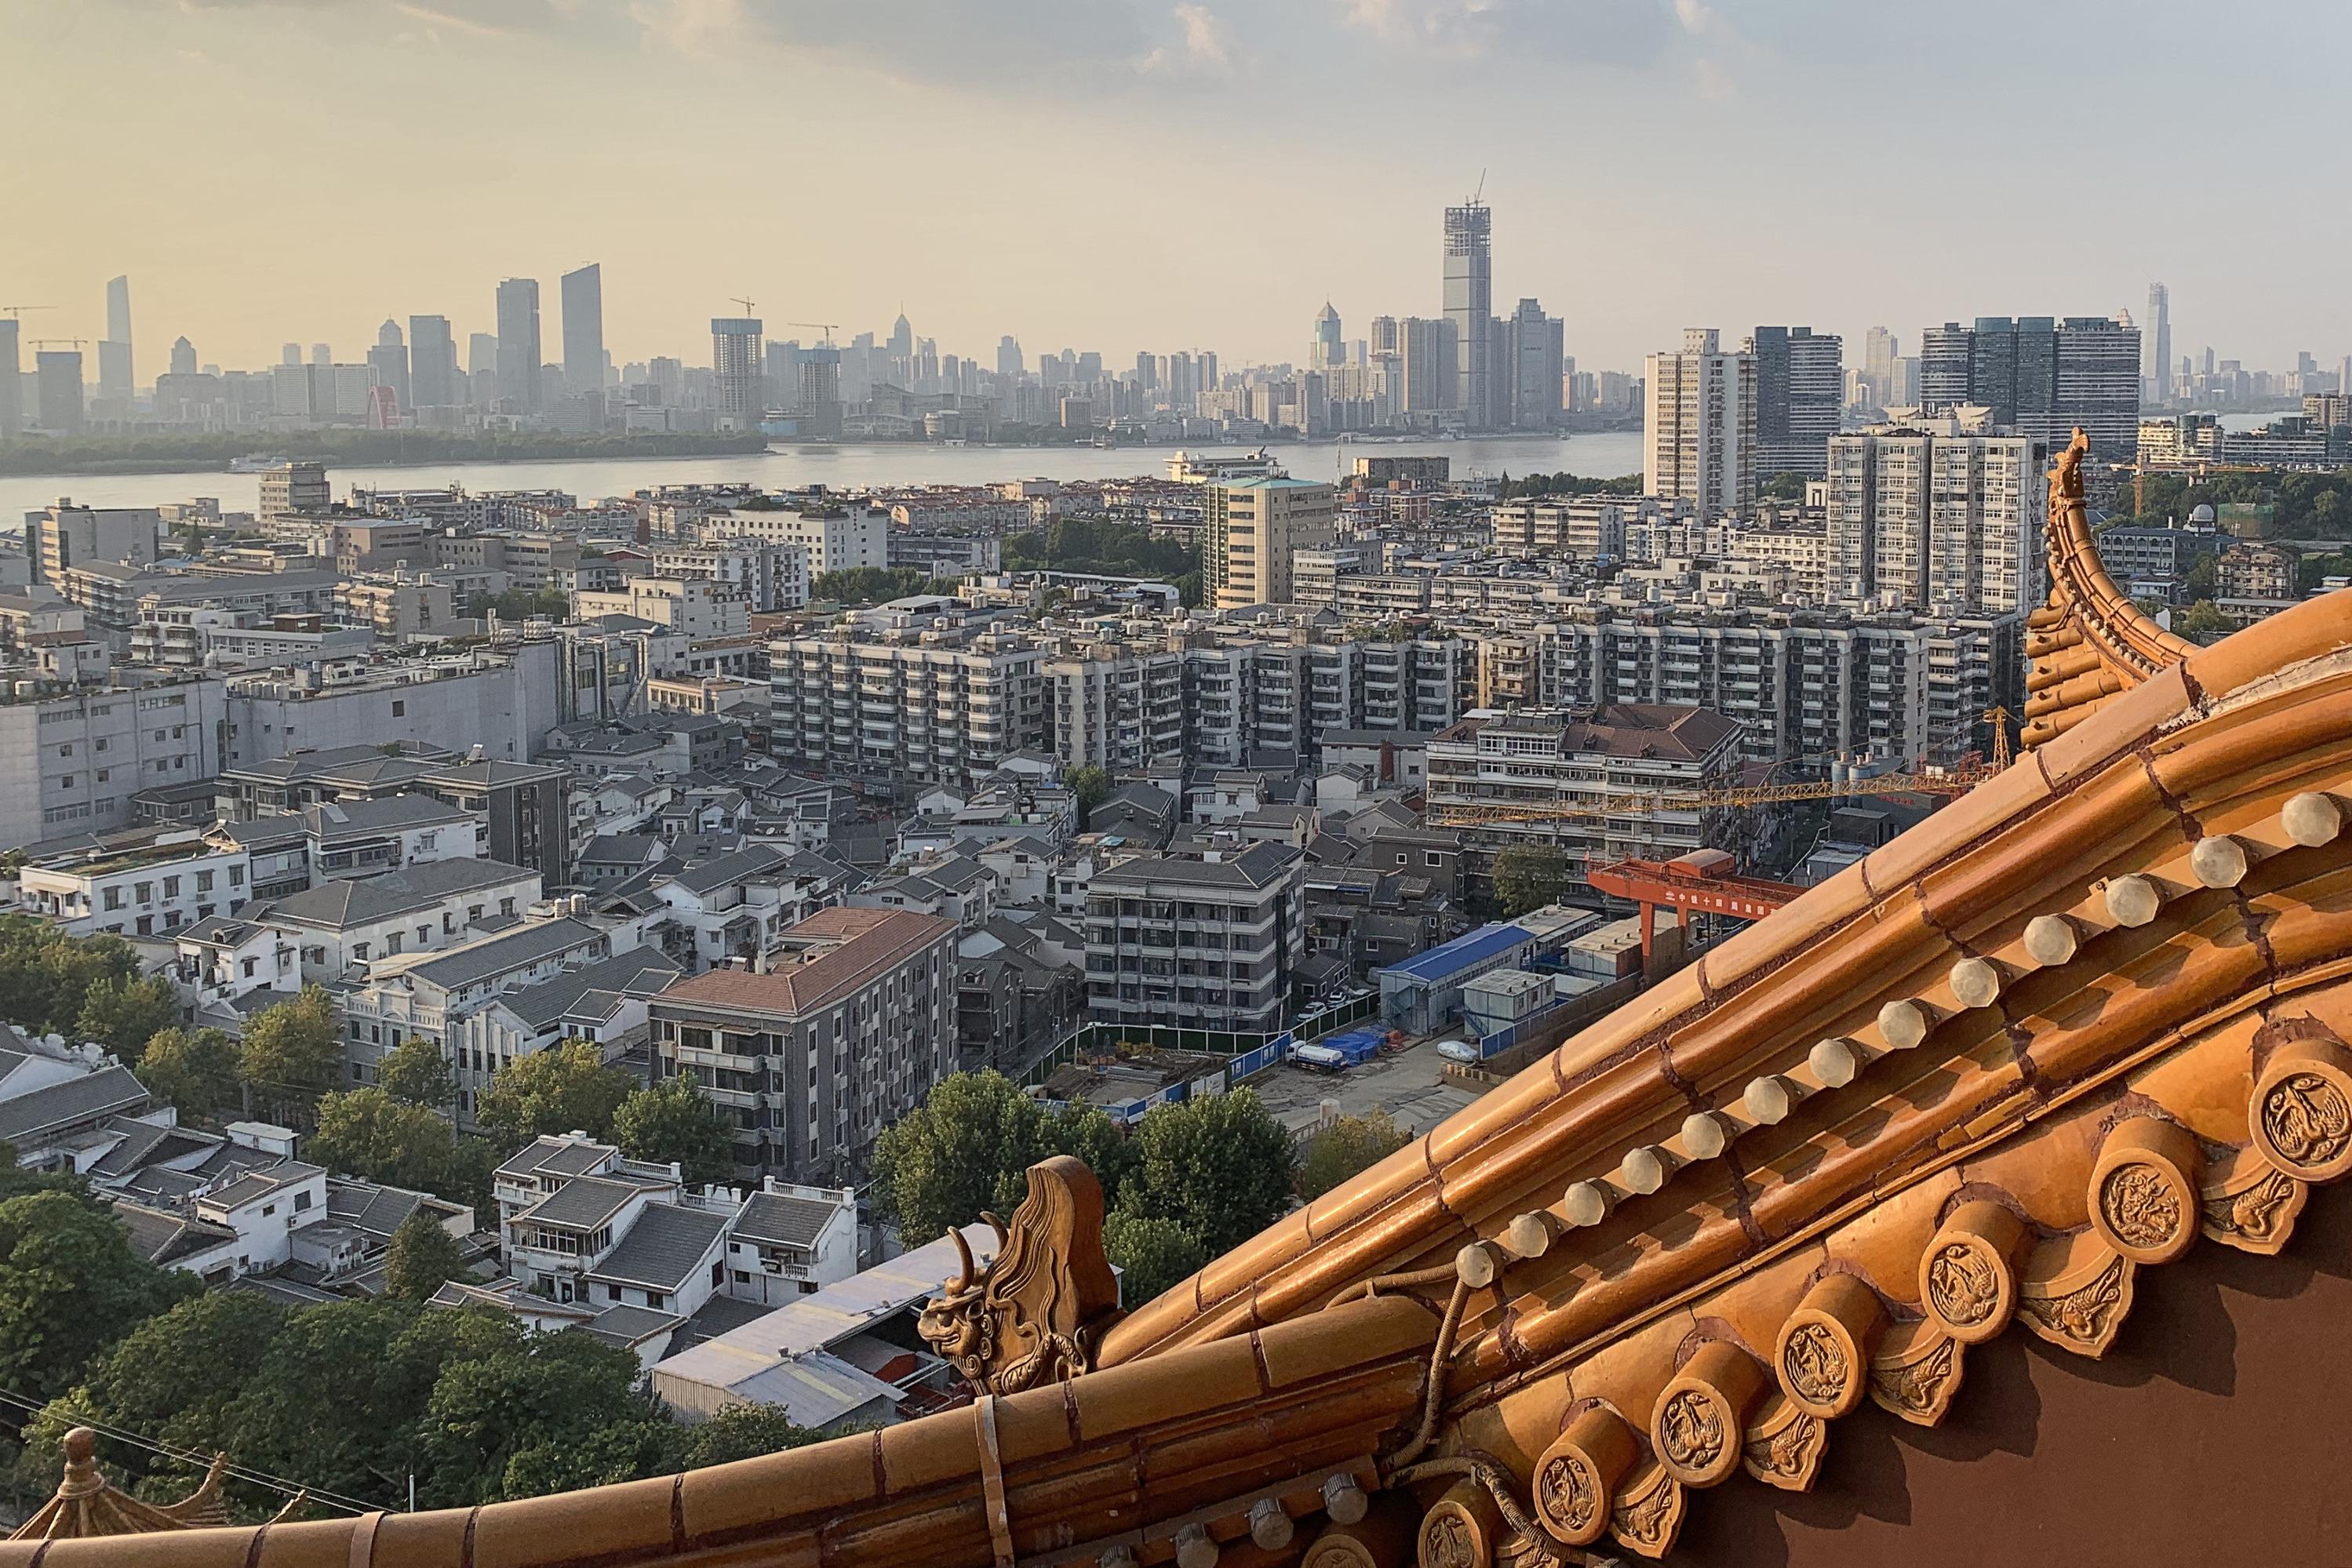 Китай. Ухань. Вид на город и реку Янцзы с пагоды Хуанхэлоу